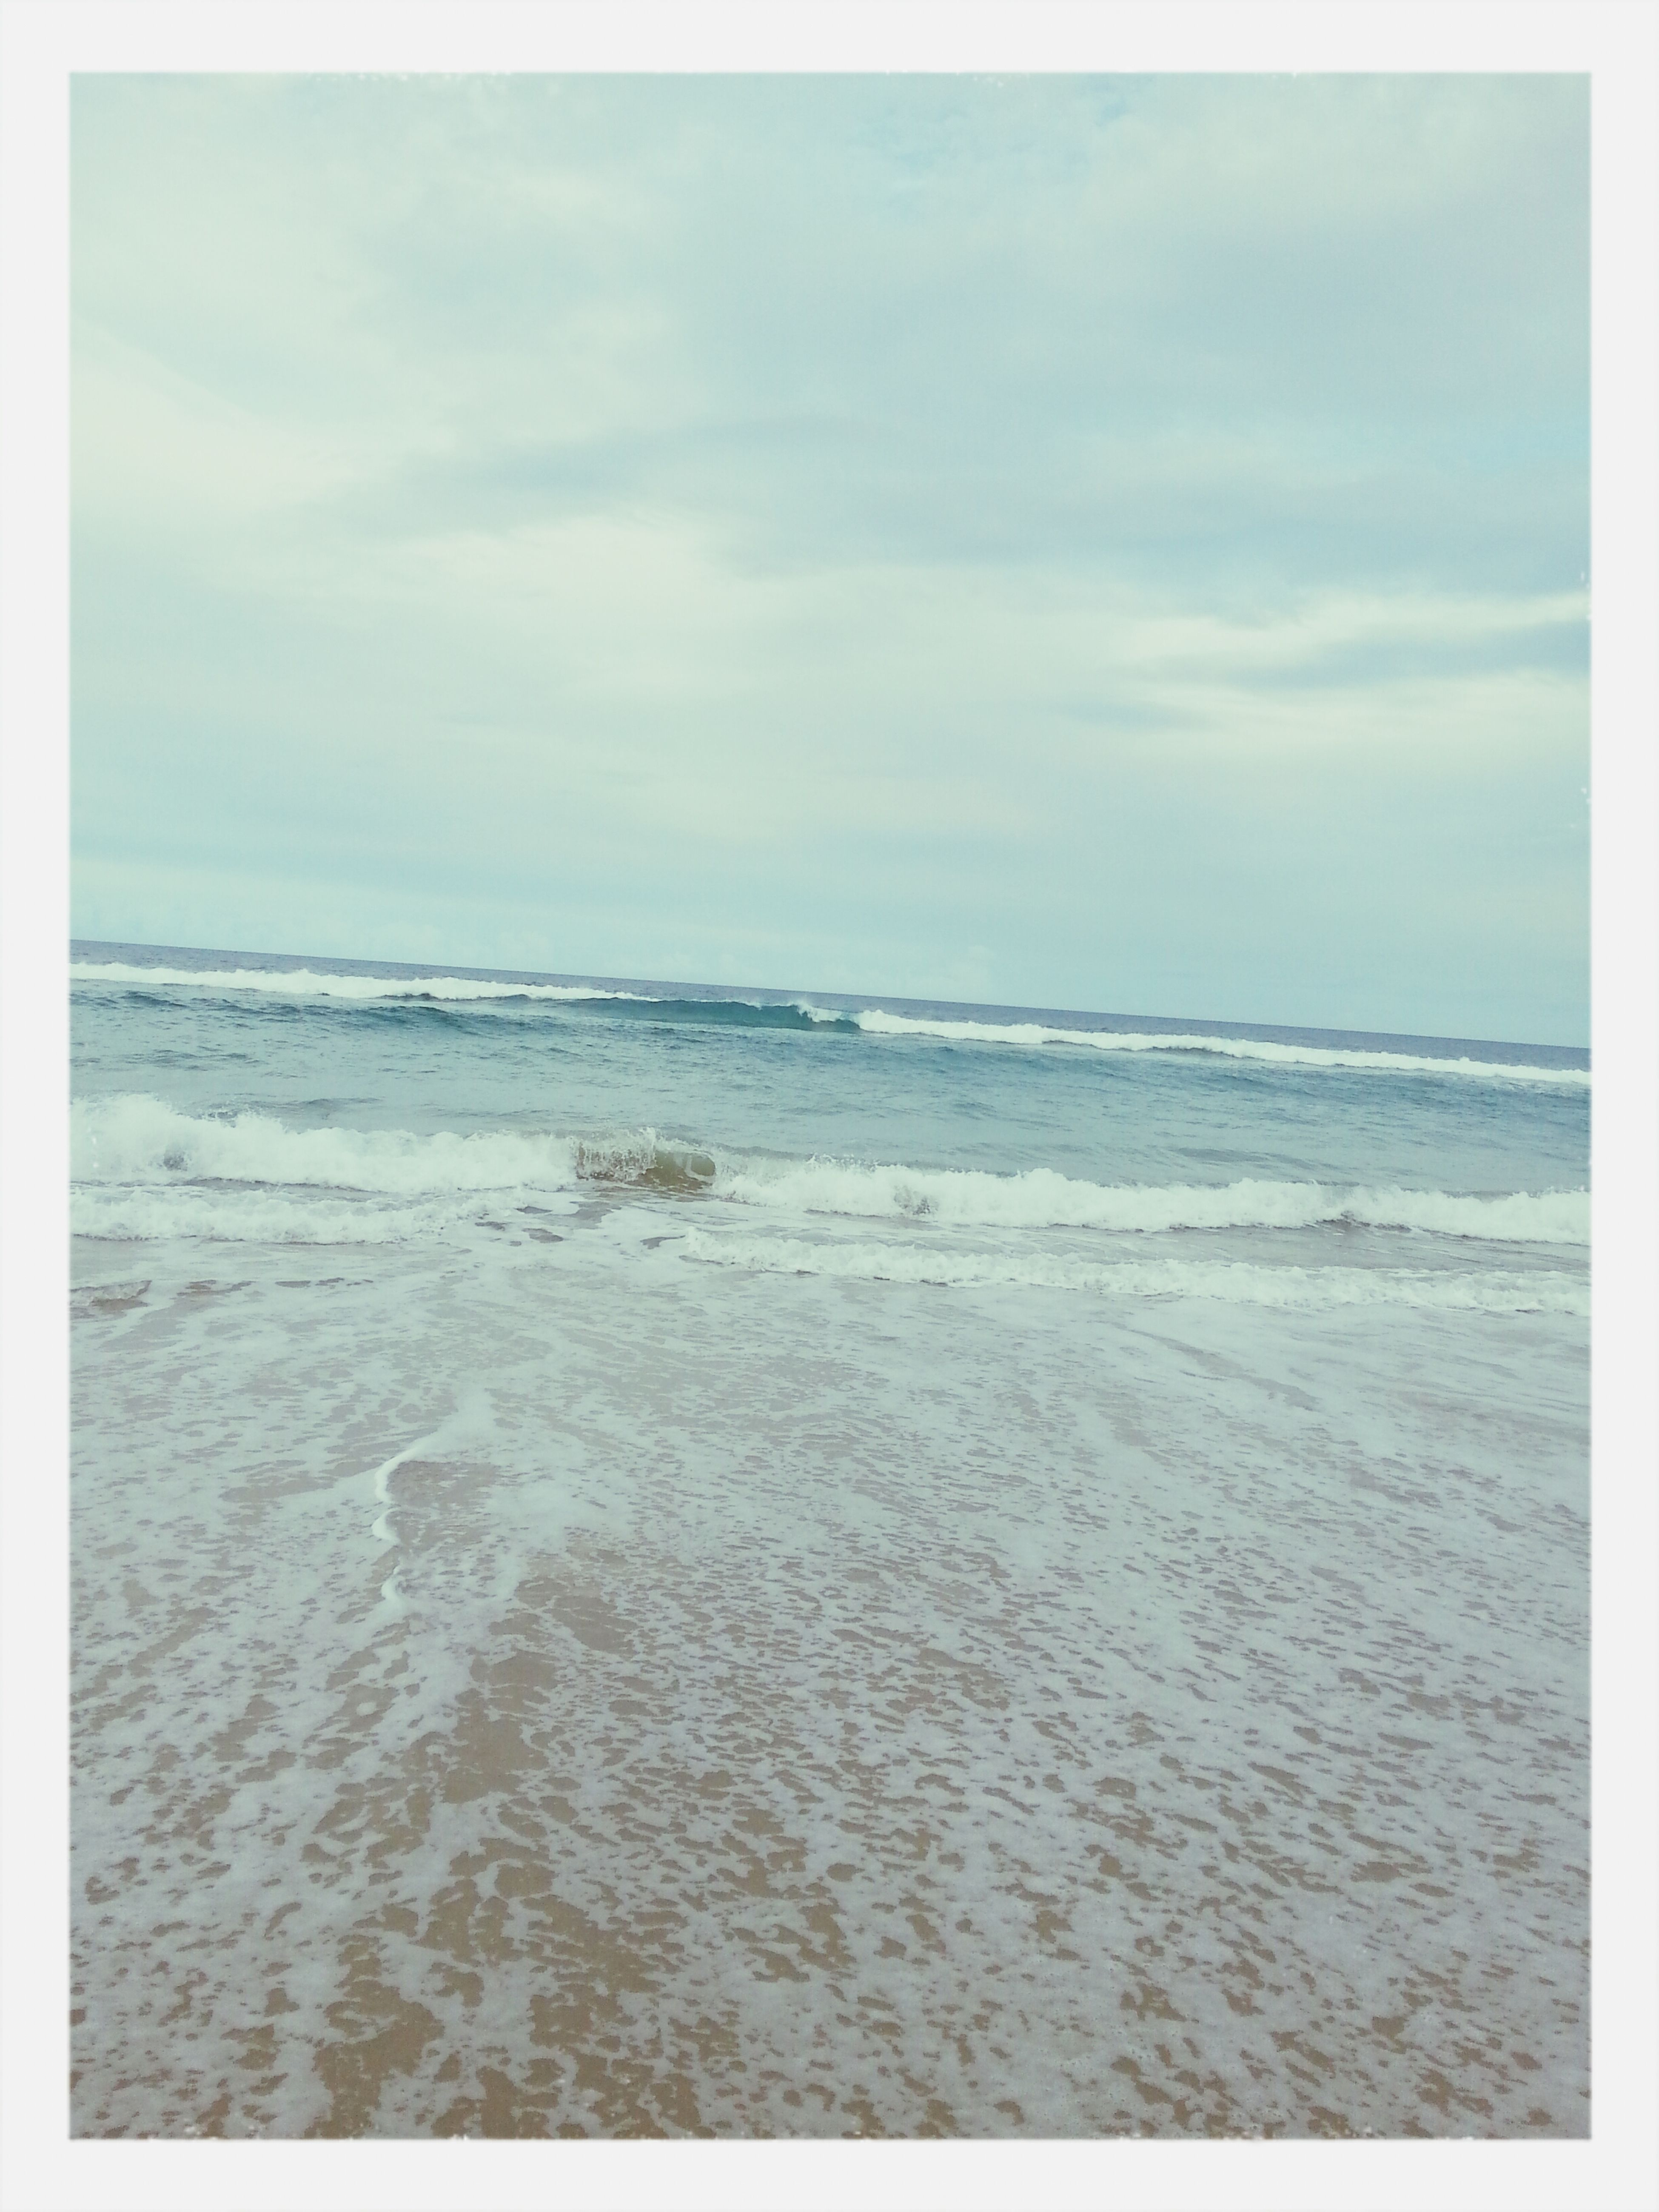 The beach was beautiful.